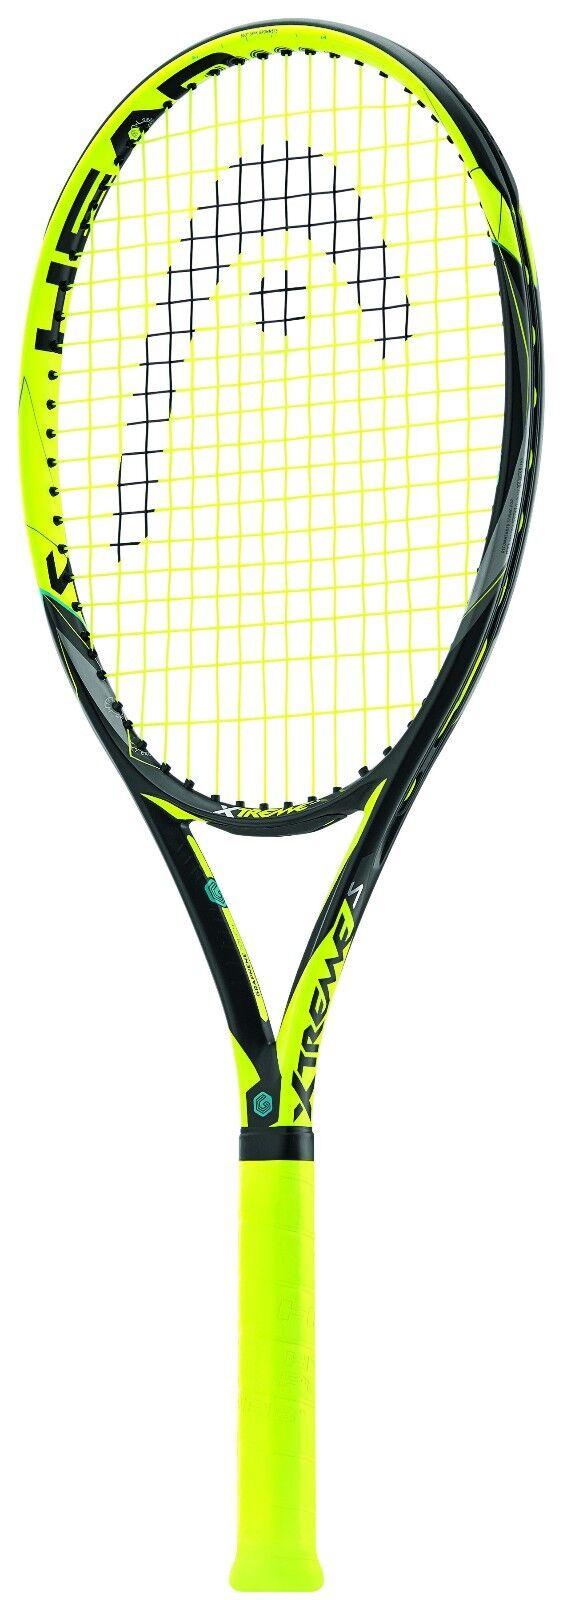 Head Graphene Touch Extreme S racchetta tennis nuovo modello